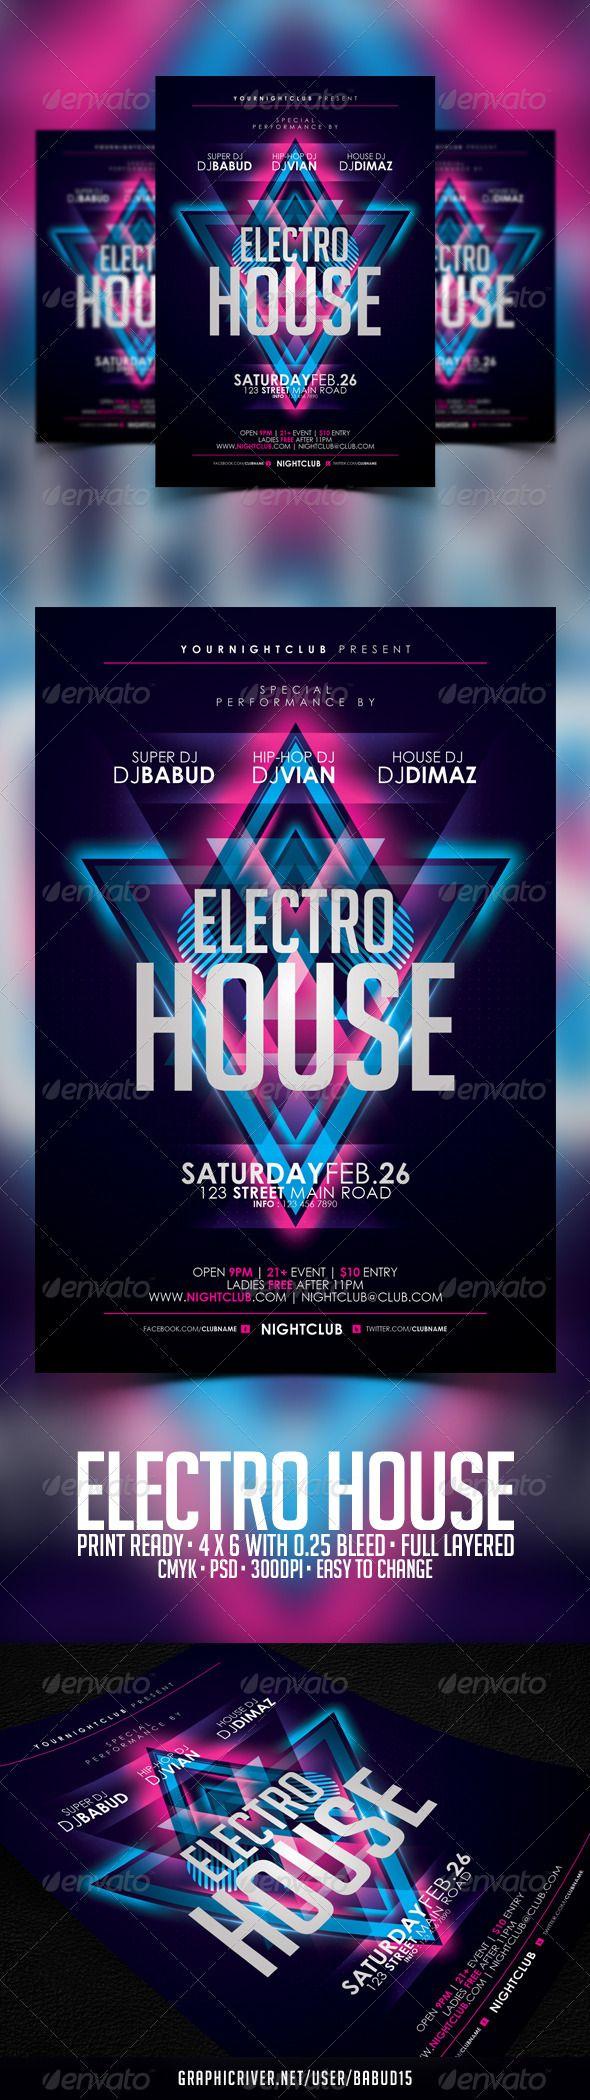 Electro House Flyer Template – Electro Flyer